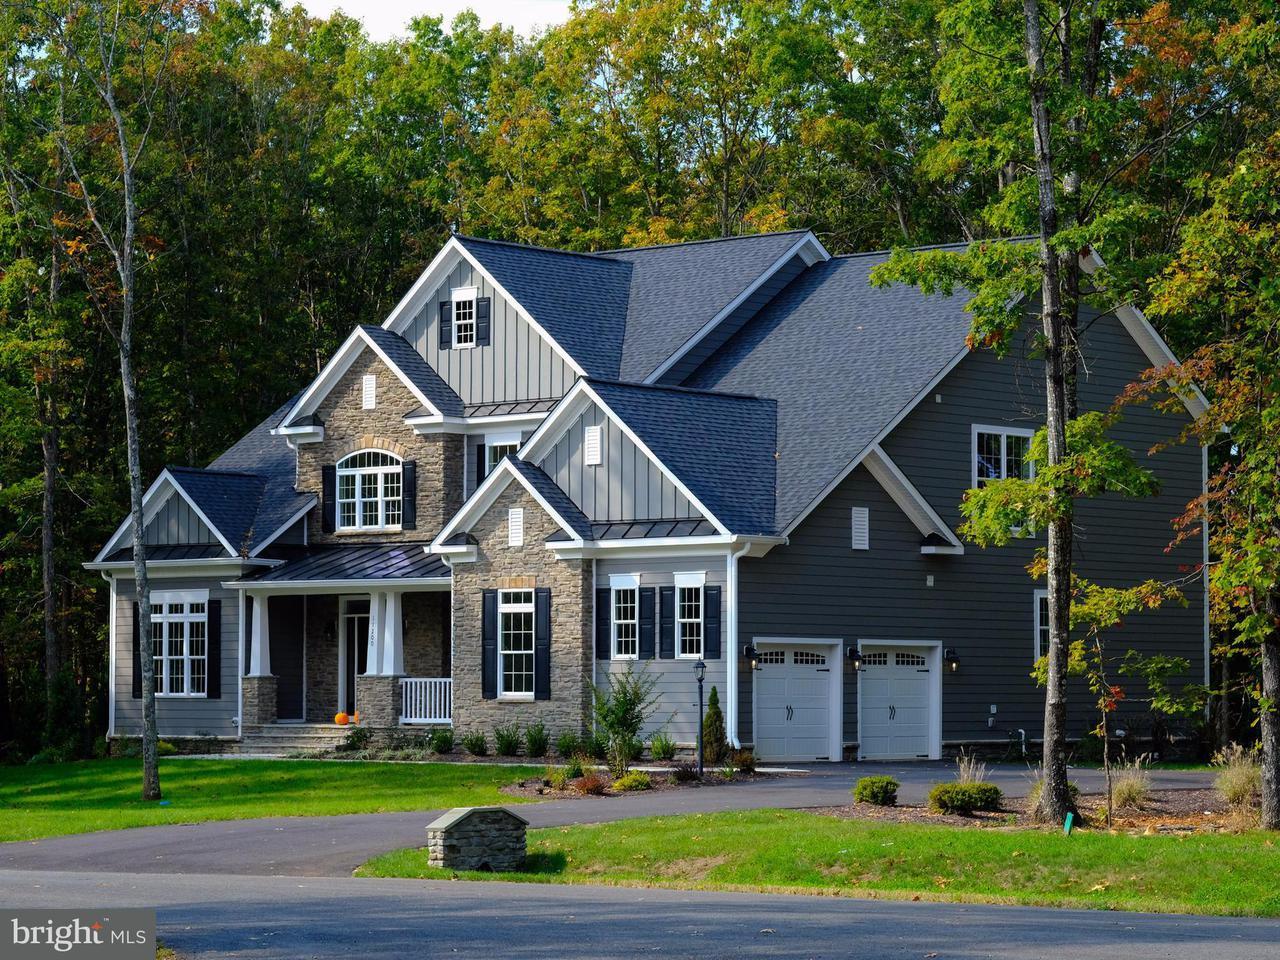 Vivienda unifamiliar por un Venta en Lot 17 Downton Avenue Lot 17 Downton Avenue Spotsylvania, Virginia 22553 Estados Unidos